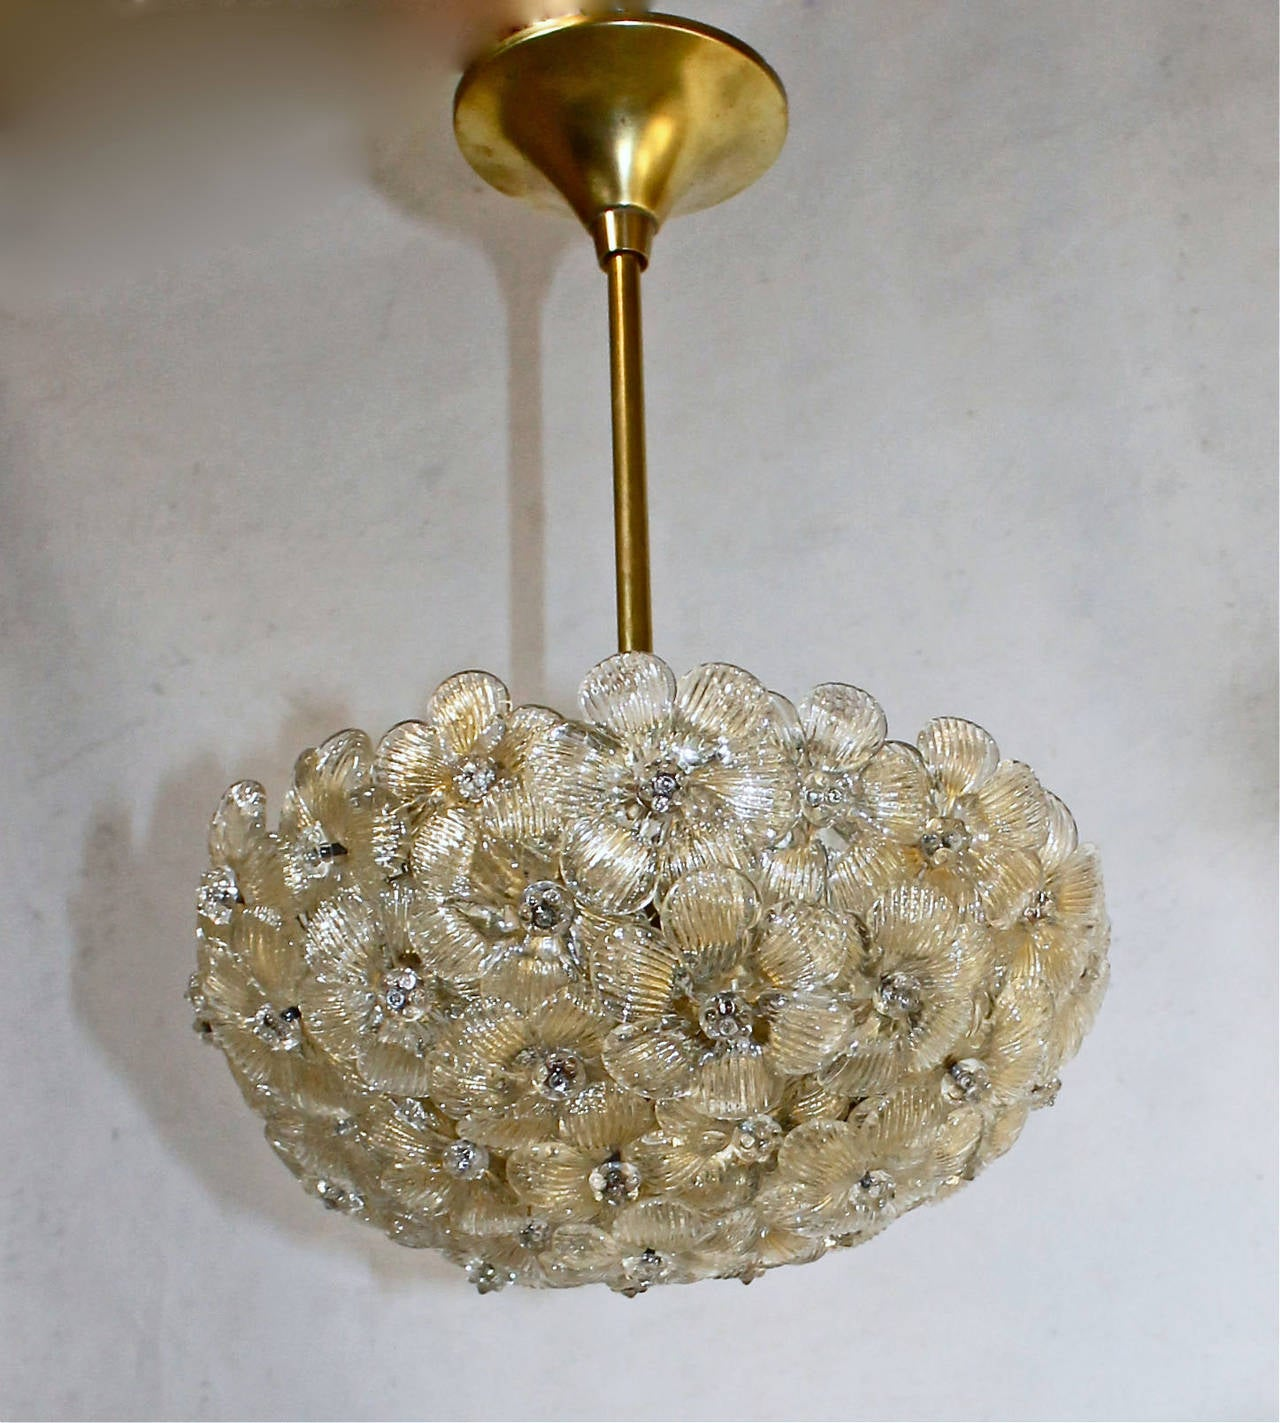 barovier murano glass floral light ceiling pendant at 1stdibs. Black Bedroom Furniture Sets. Home Design Ideas